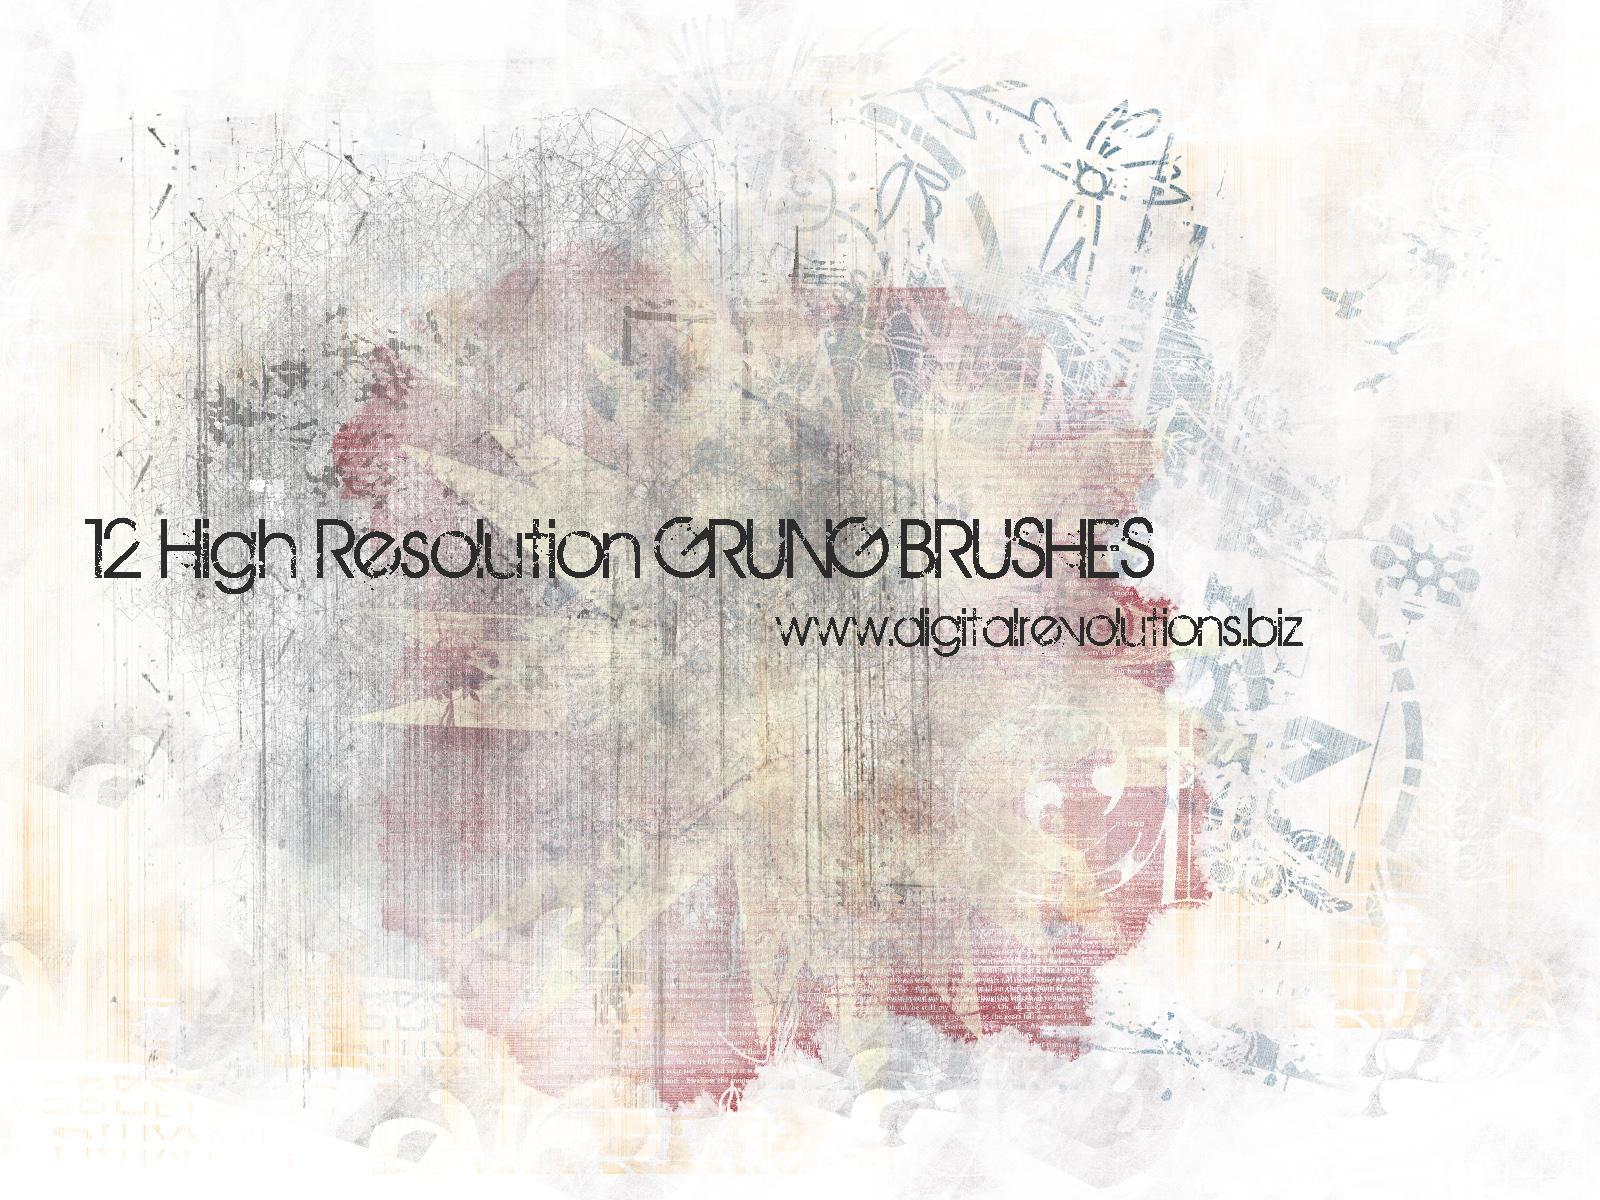 Free Grunge Photoshop Brushes by digitalrevolutions